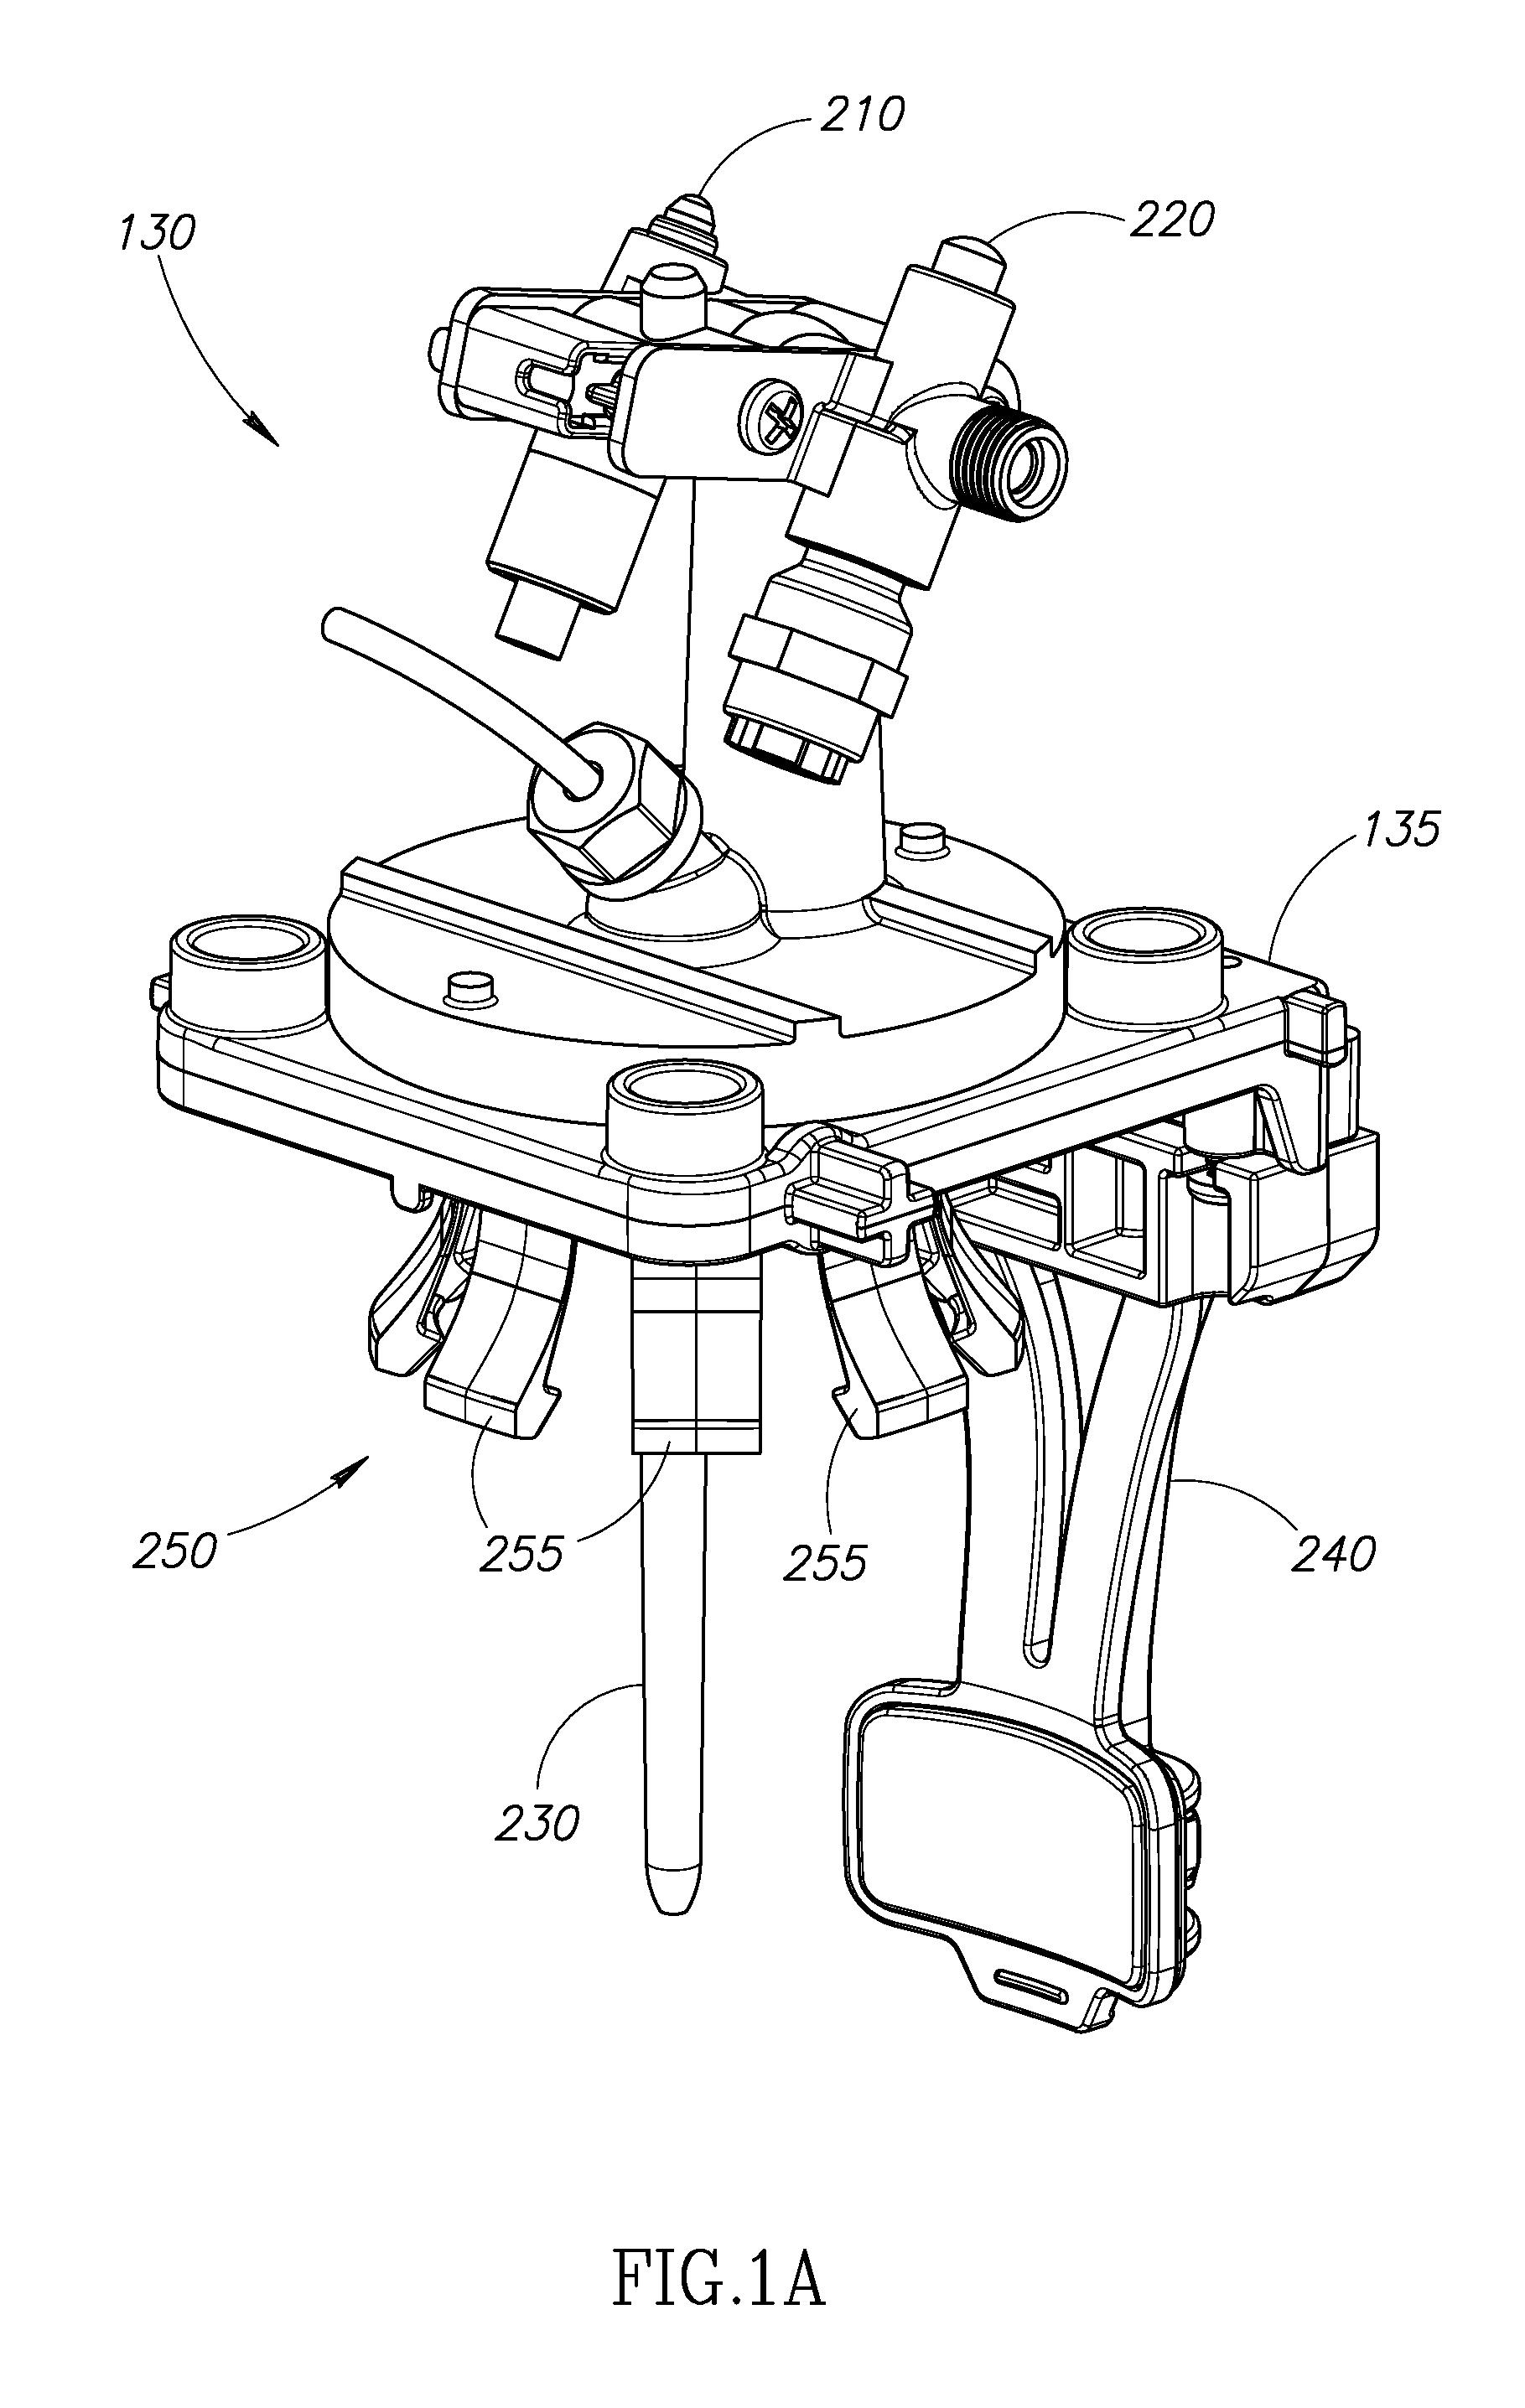 Sodastream Parts Diagram